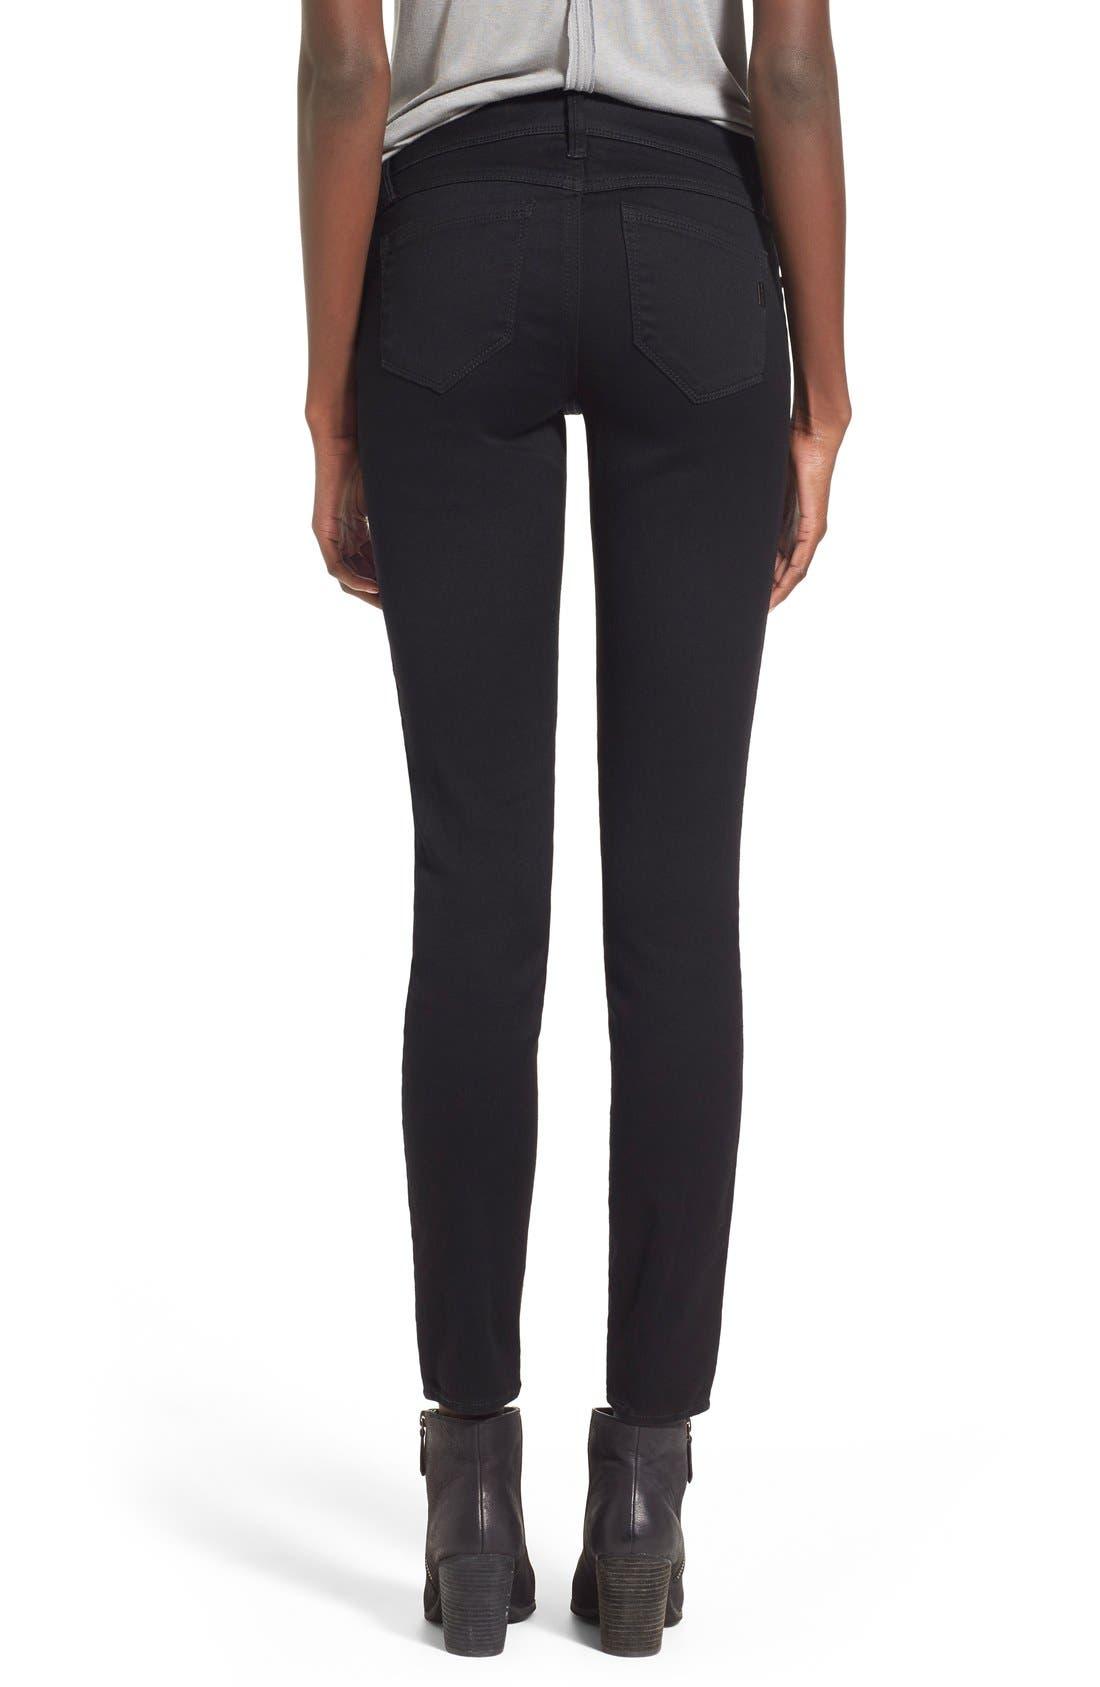 Butter Skinny Jeans,                             Alternate thumbnail 2, color,                             Black